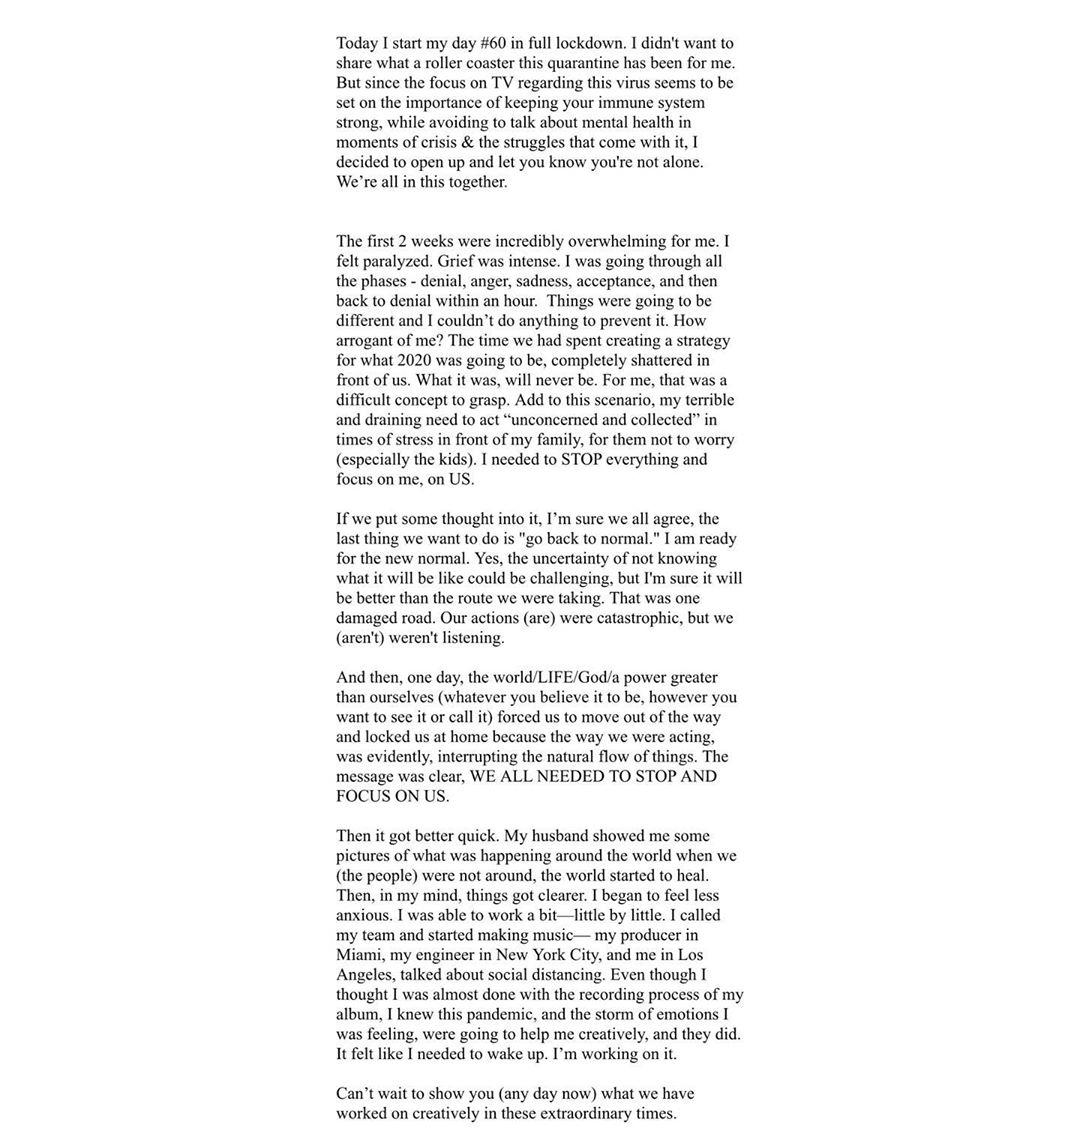 carta de Ricky Martin